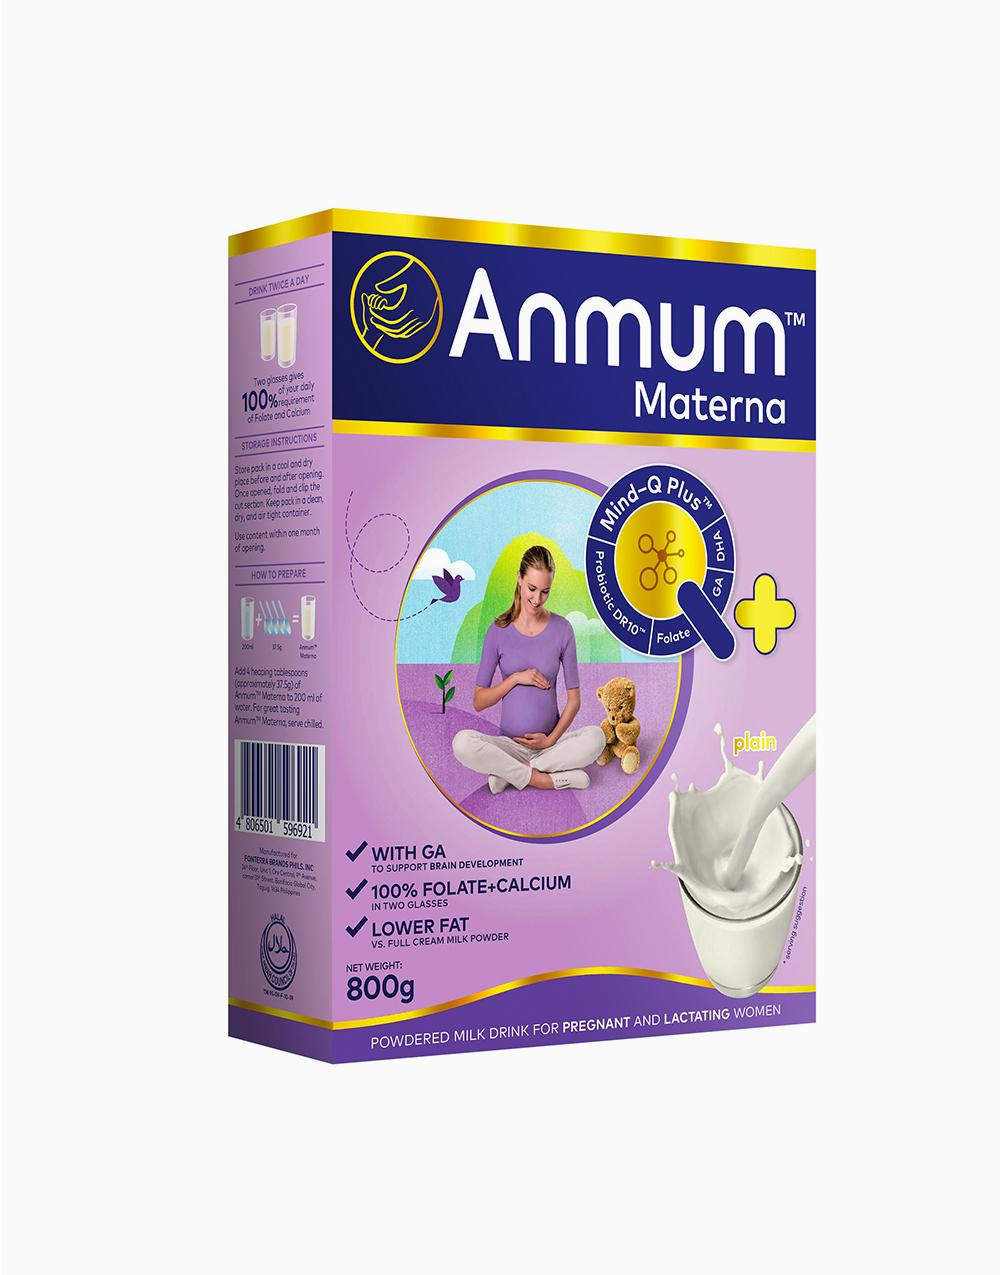 Anmum Materna Plain (800g) by Anmum